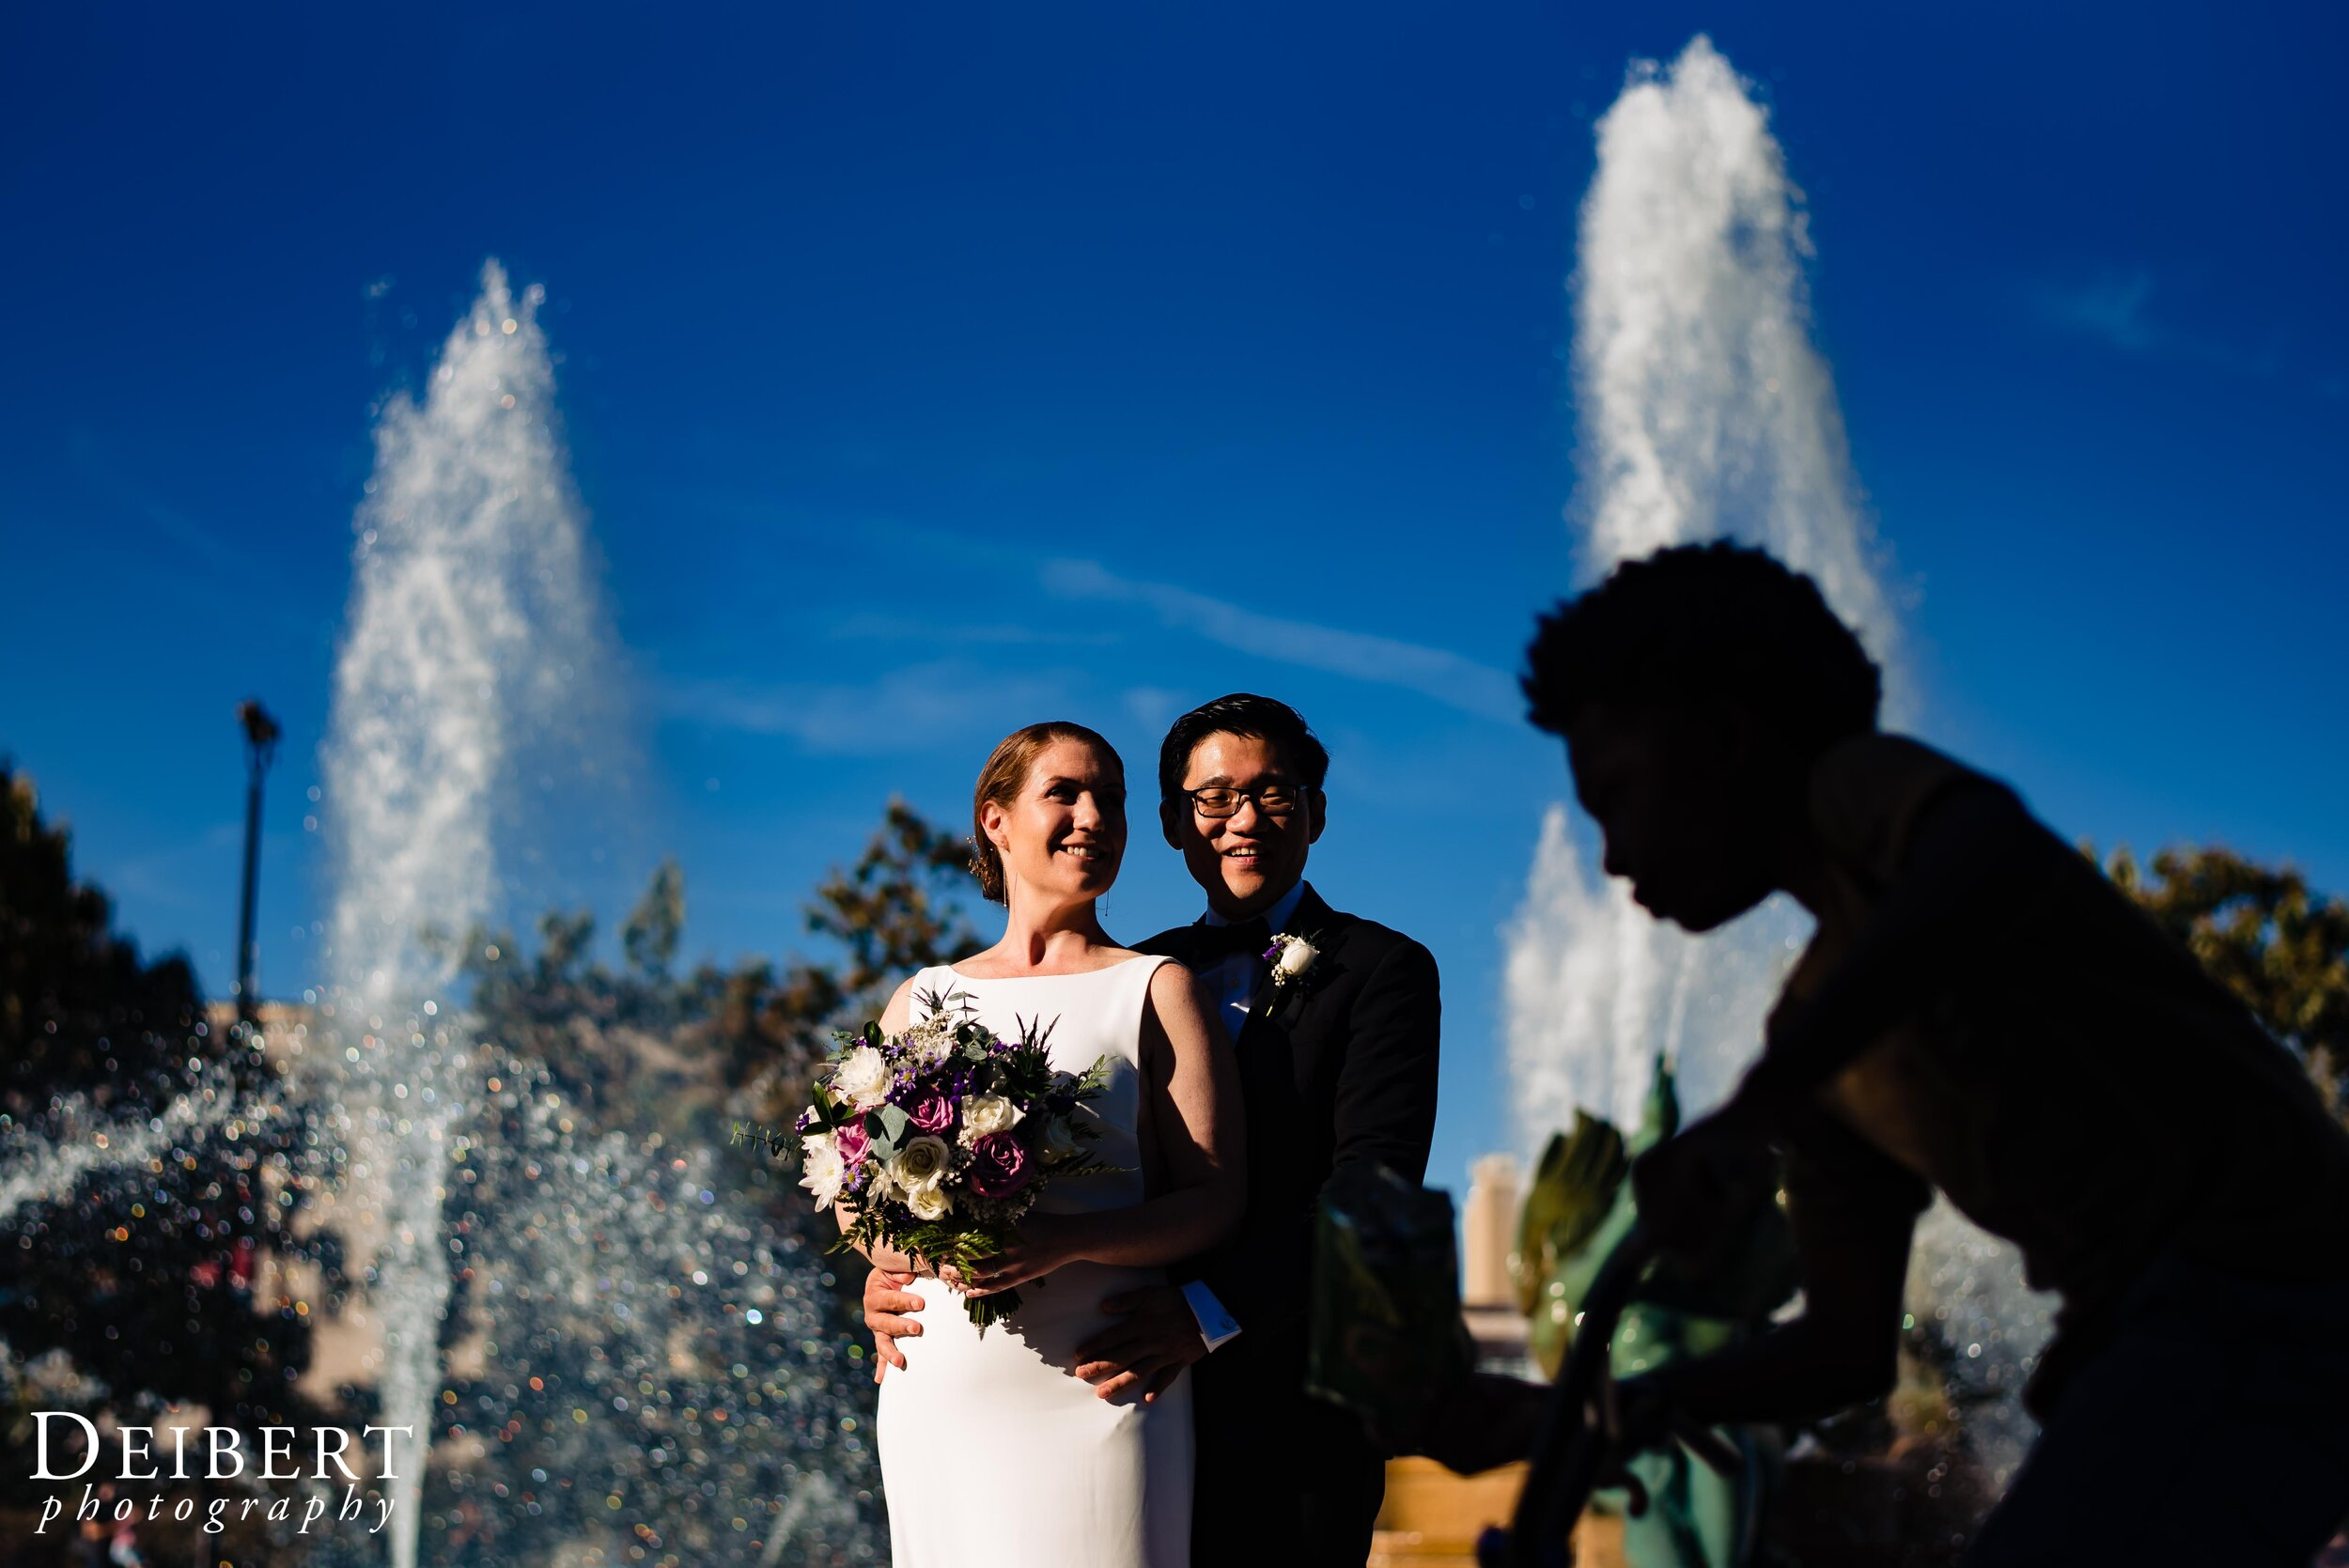 Franklin Institute Philadelpia Wedding-043.JPG